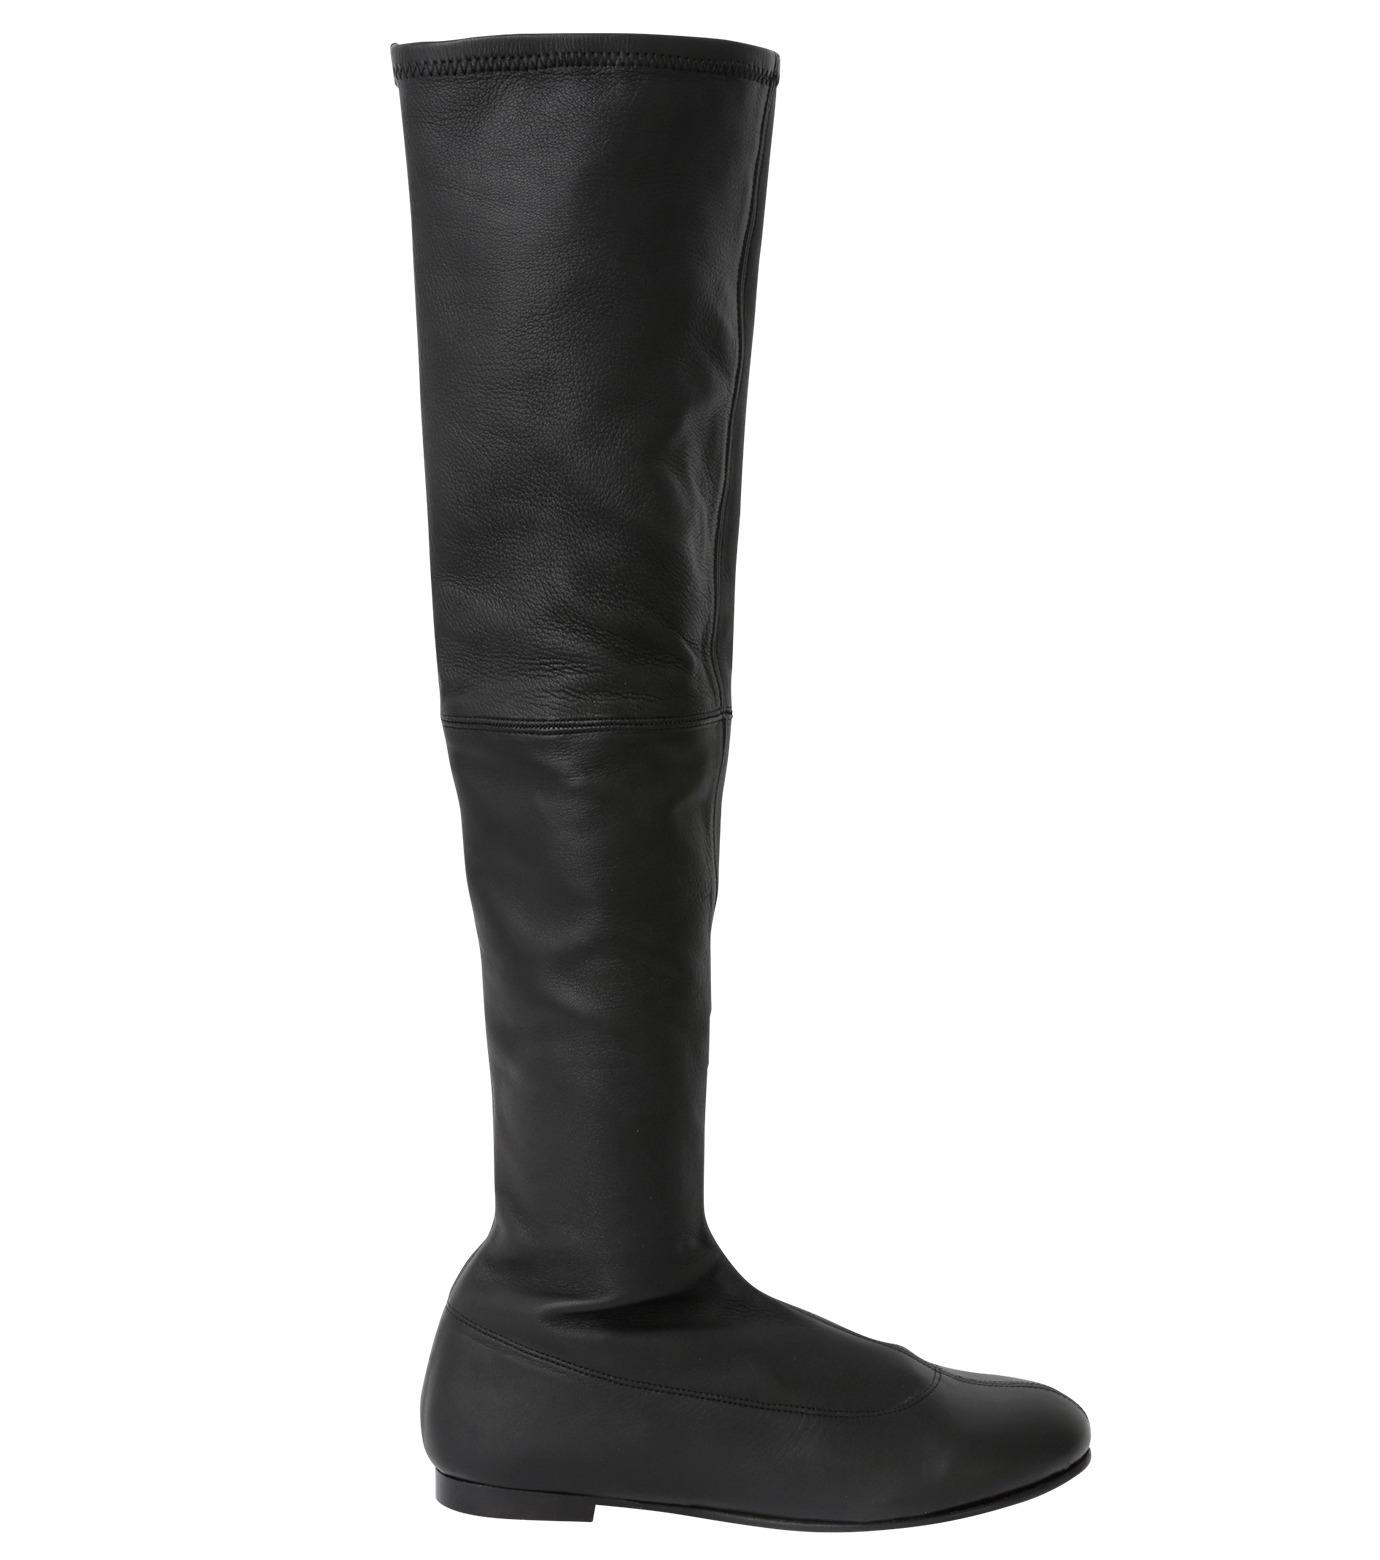 PIPPICHIC(ピッピシック)のStrech Knee High Boots-BLACK(ブーツ/boots)-PP15-STR-N14-13 拡大詳細画像1